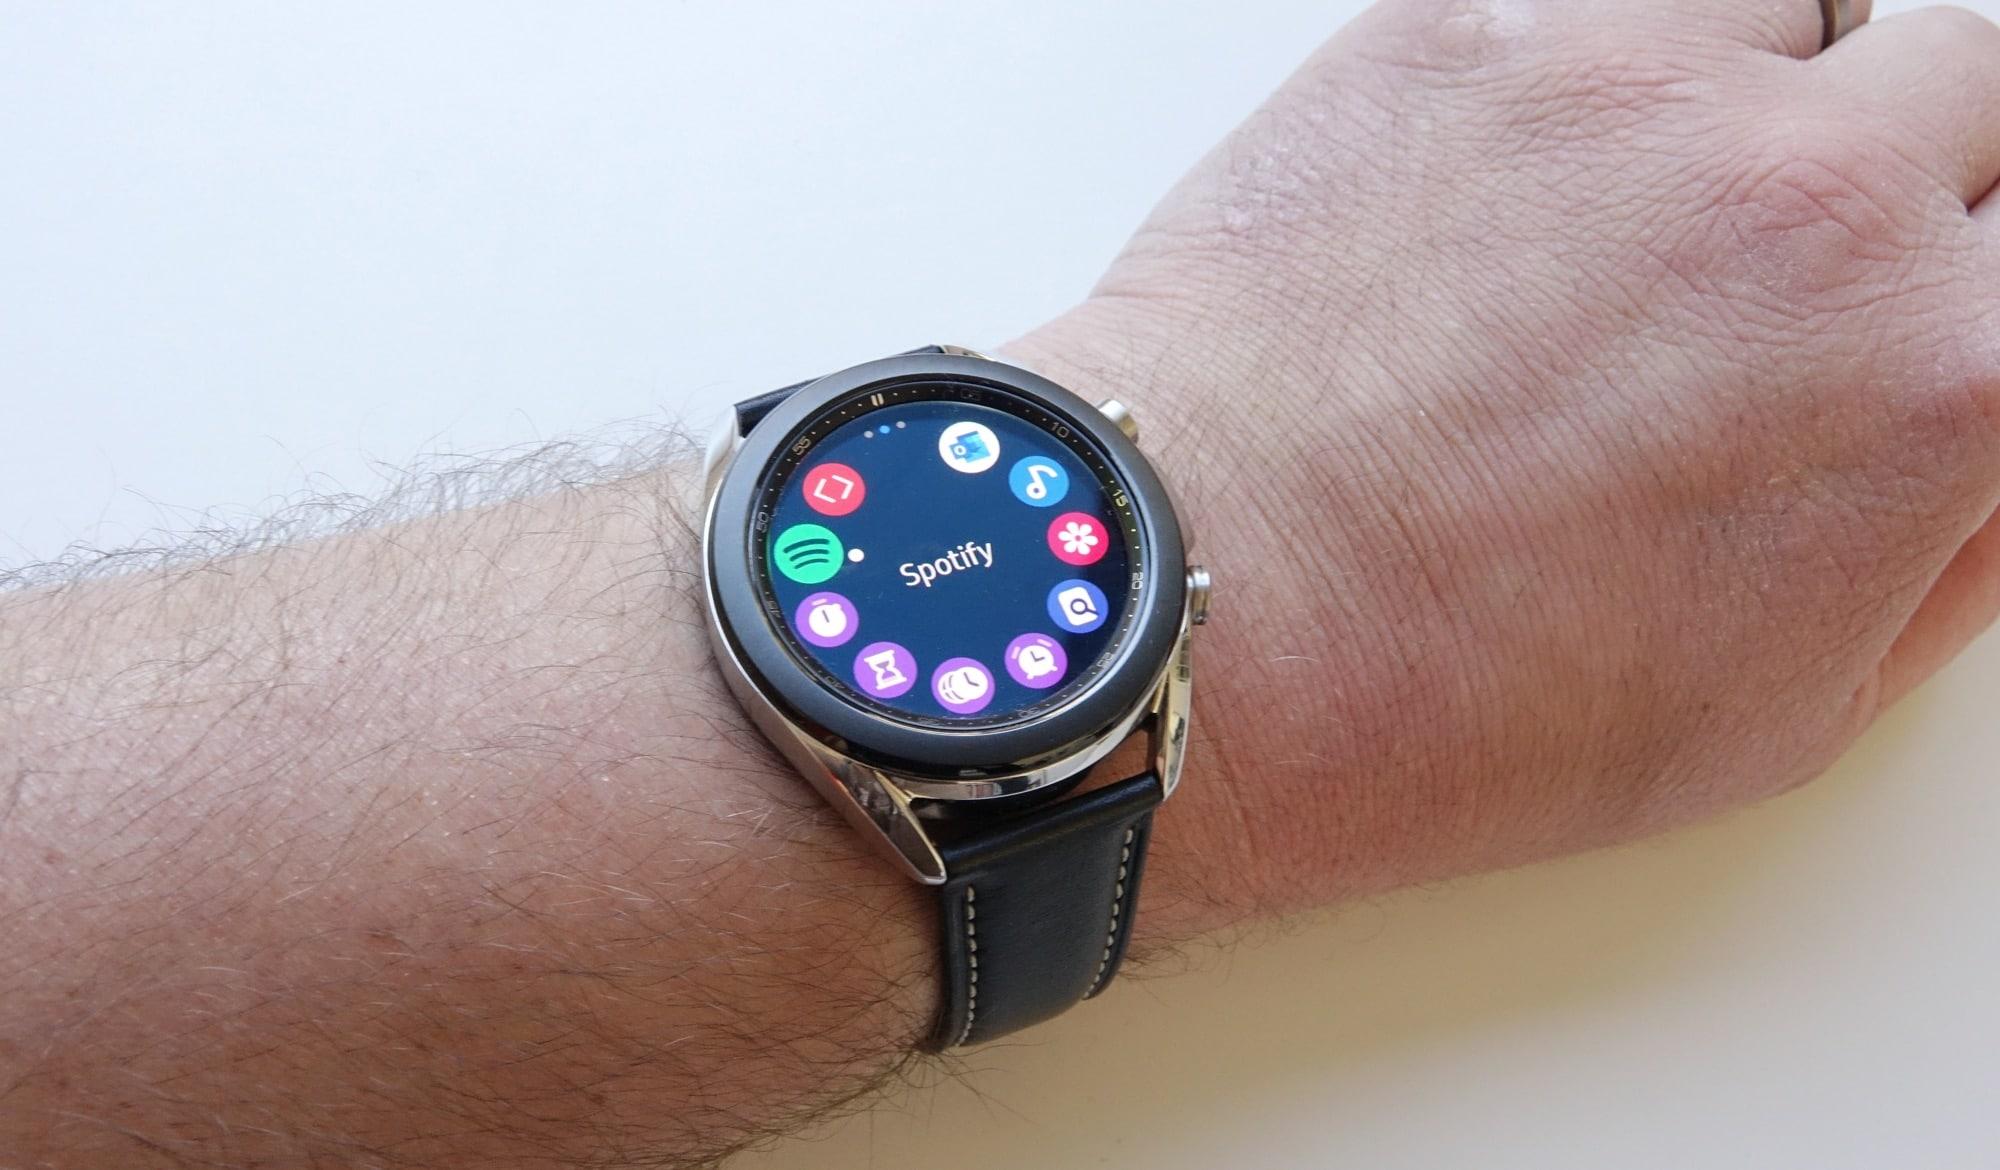 The app menu on the Galaxy Watch 3